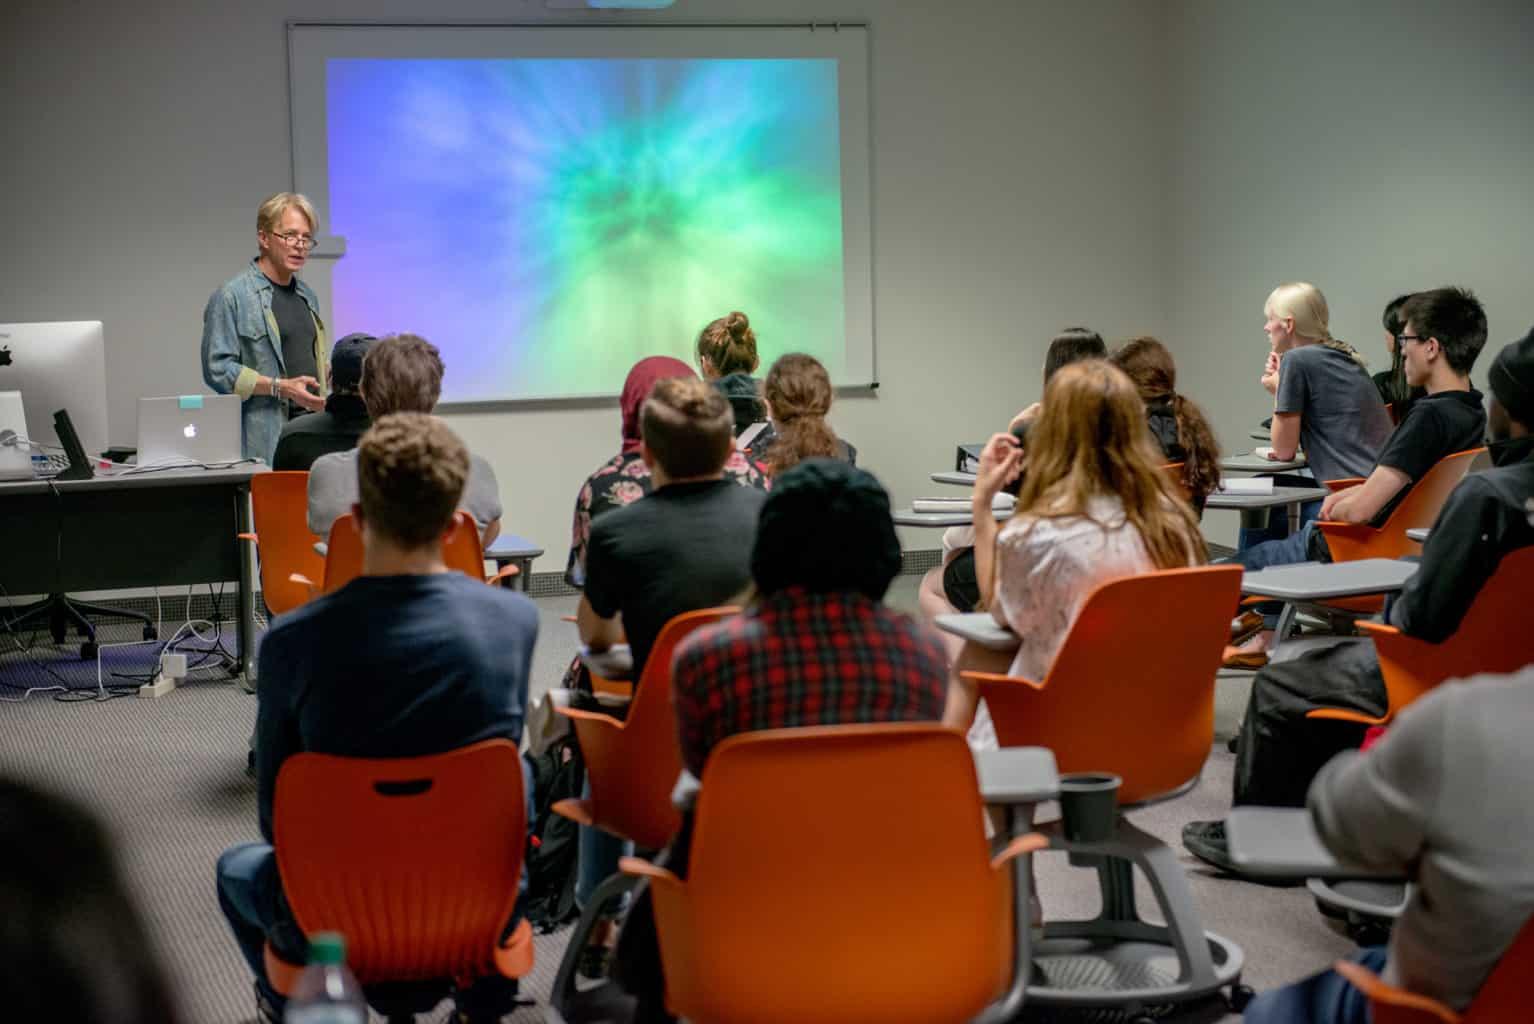 students in classroom listening to professor.